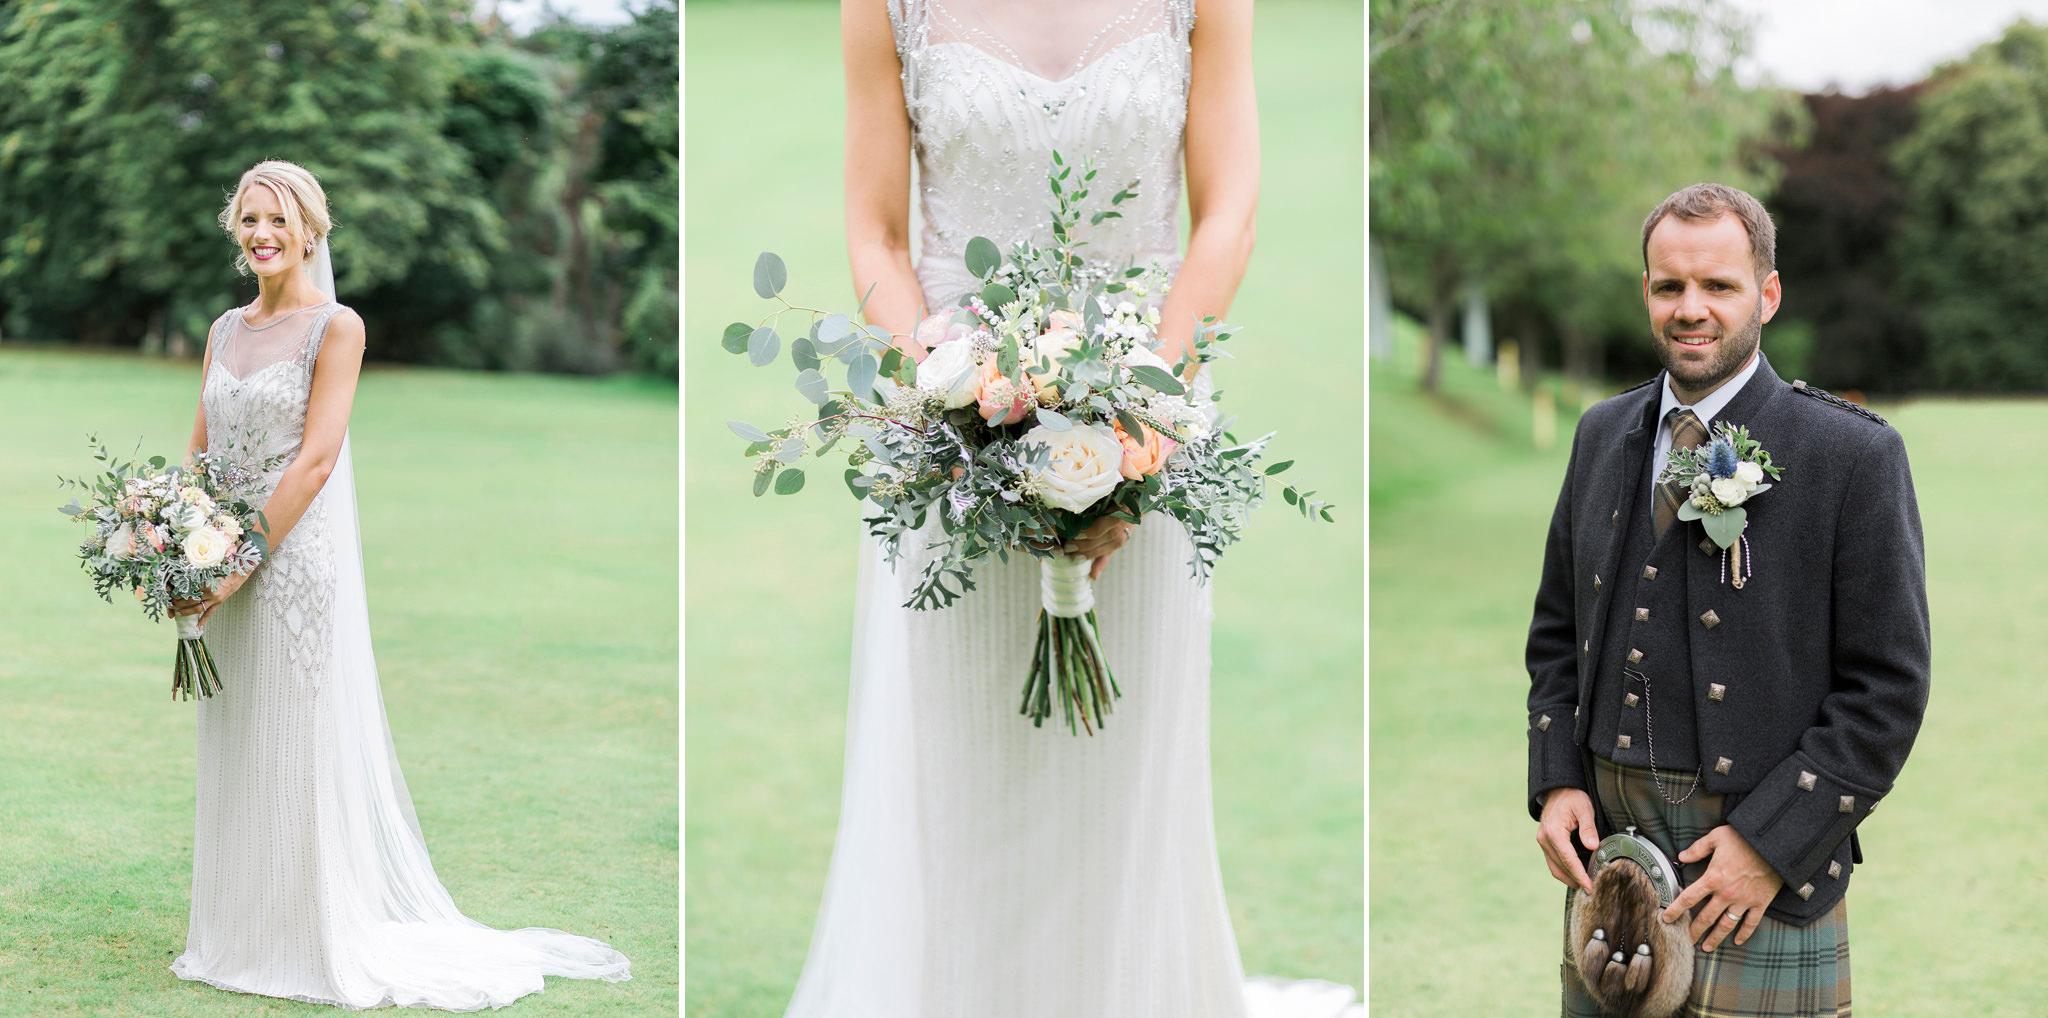 081-natural-wedding-photography.jpg